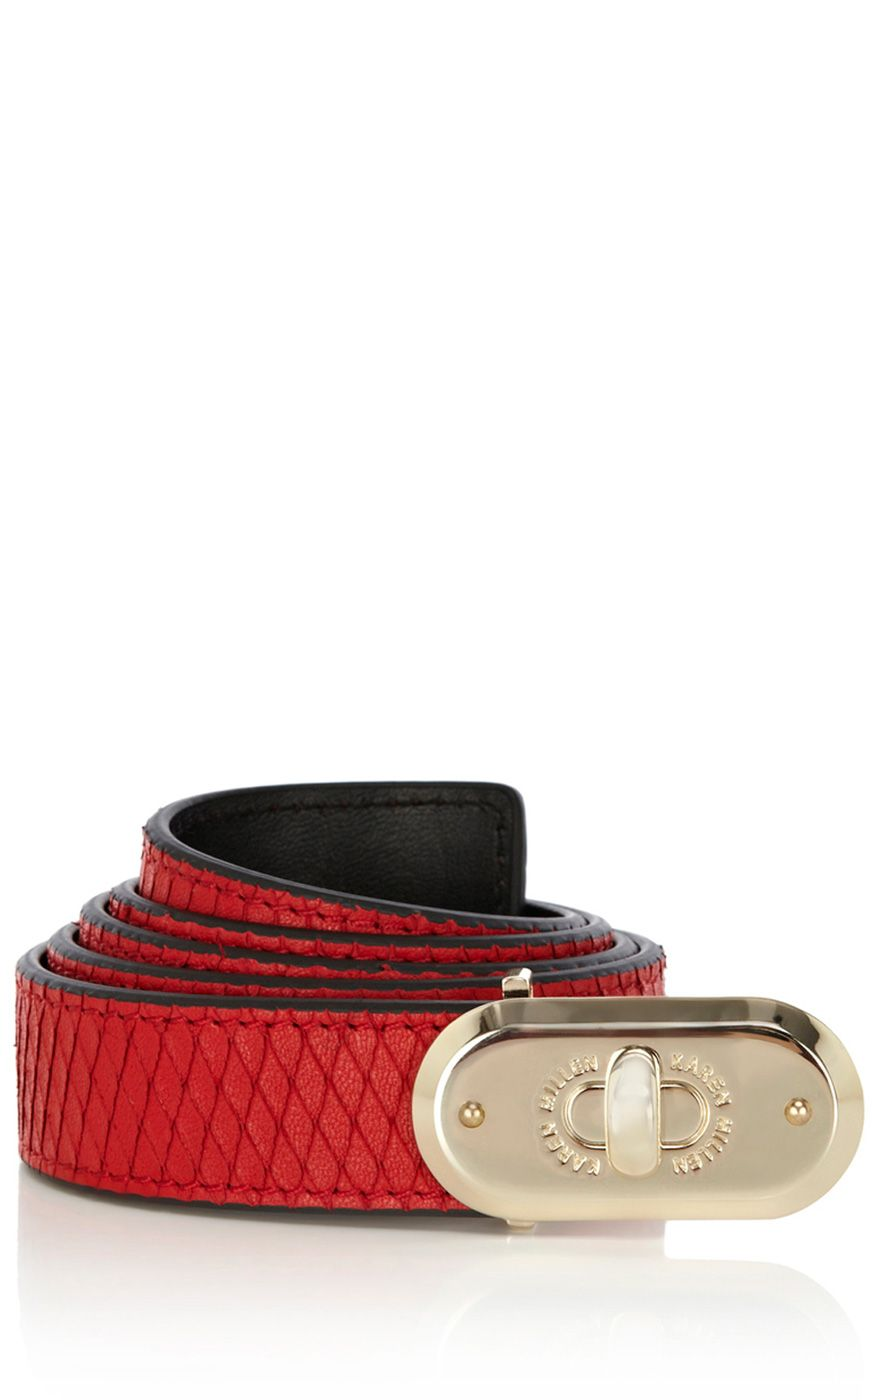 KAREN MILLEN   red textured snake skinny belt